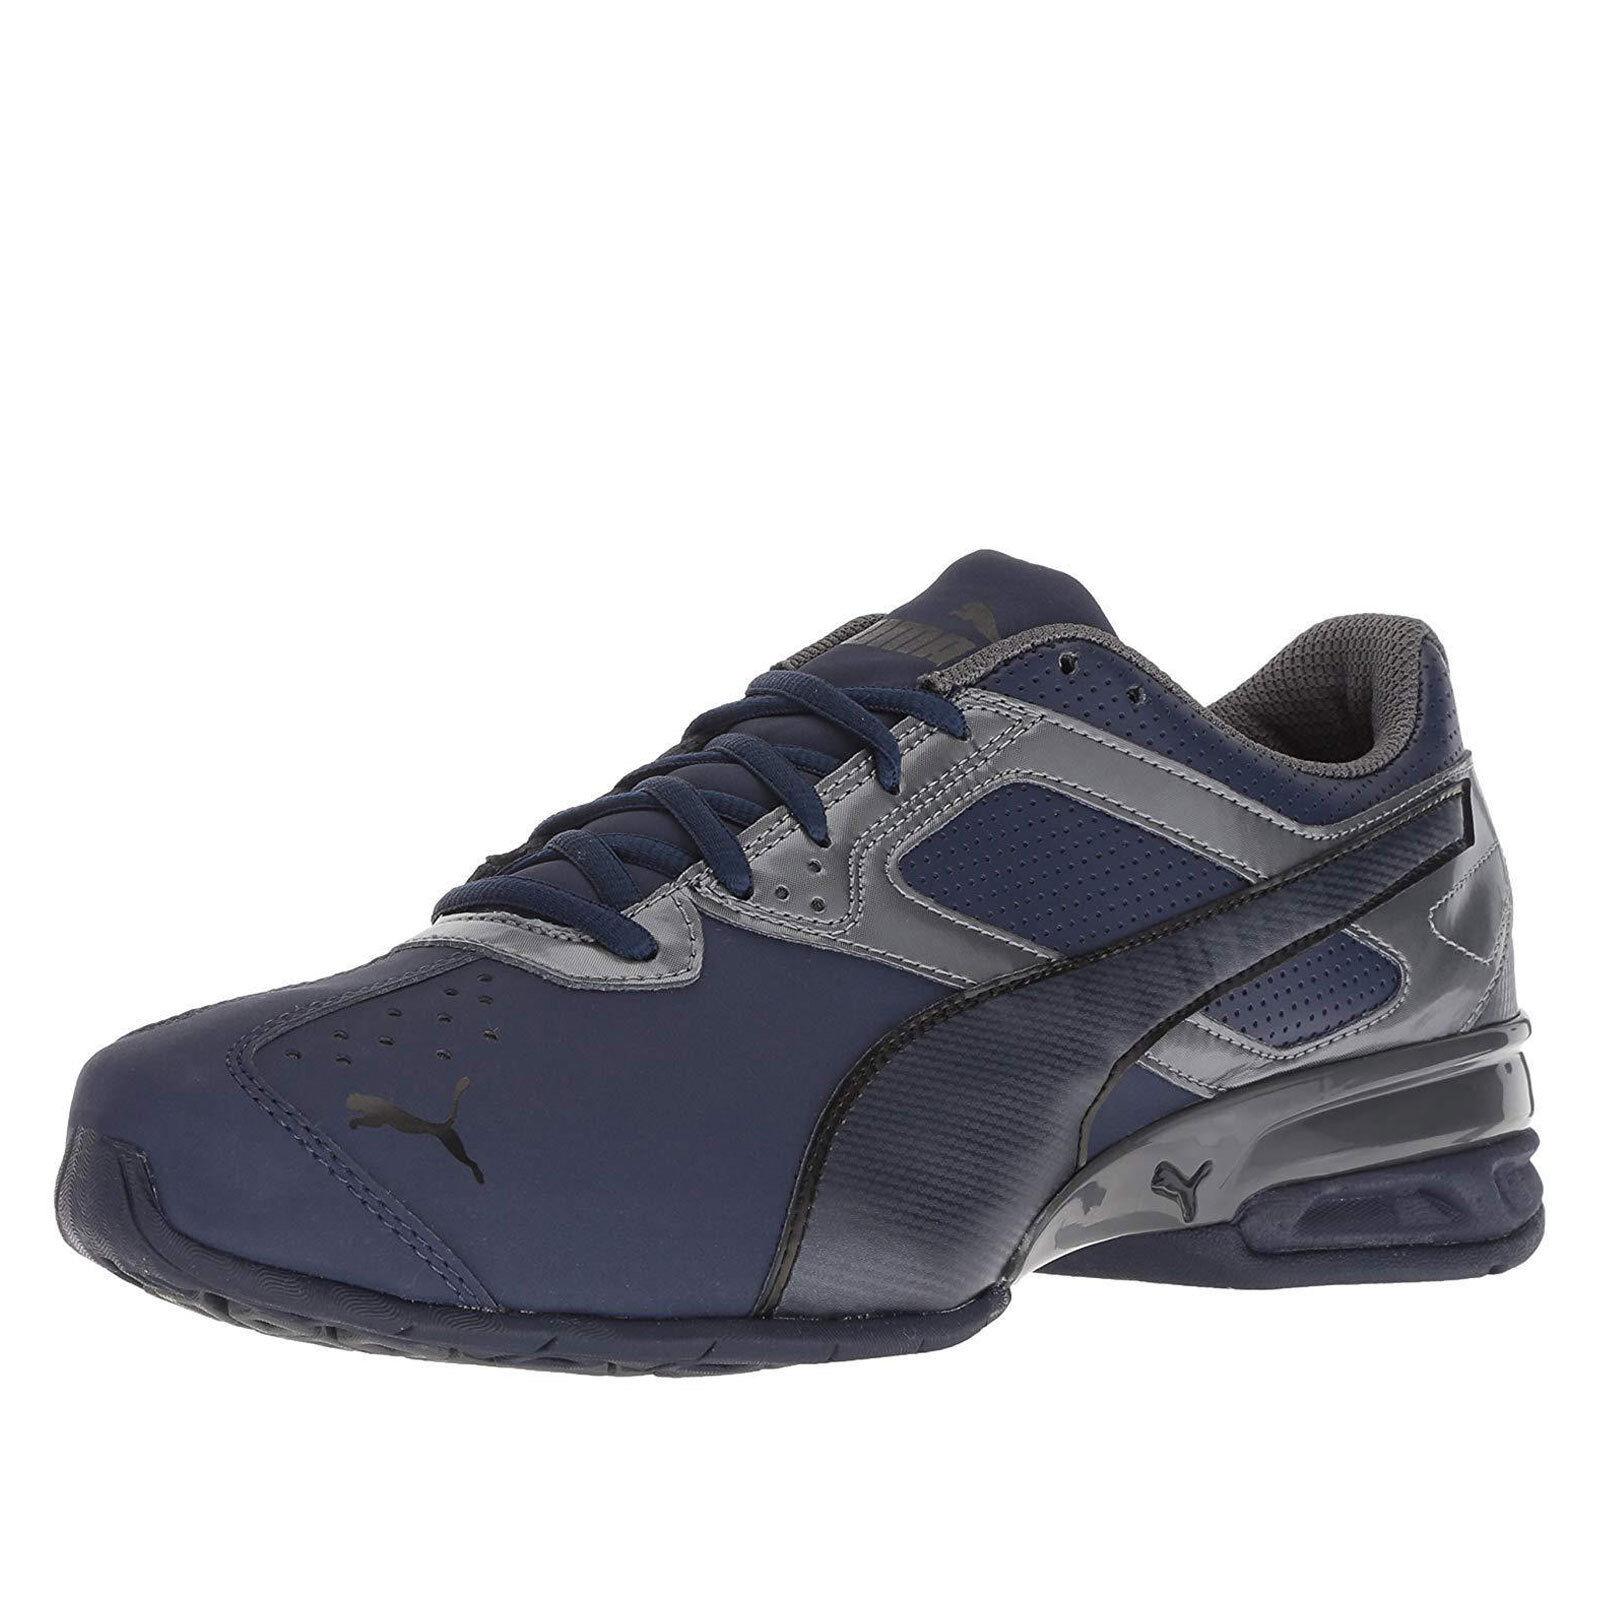 PUMA Tazon 6 FM Peacoat Train / Black Men's Run Train Peacoat Sneakers 189873-21 7a43ff